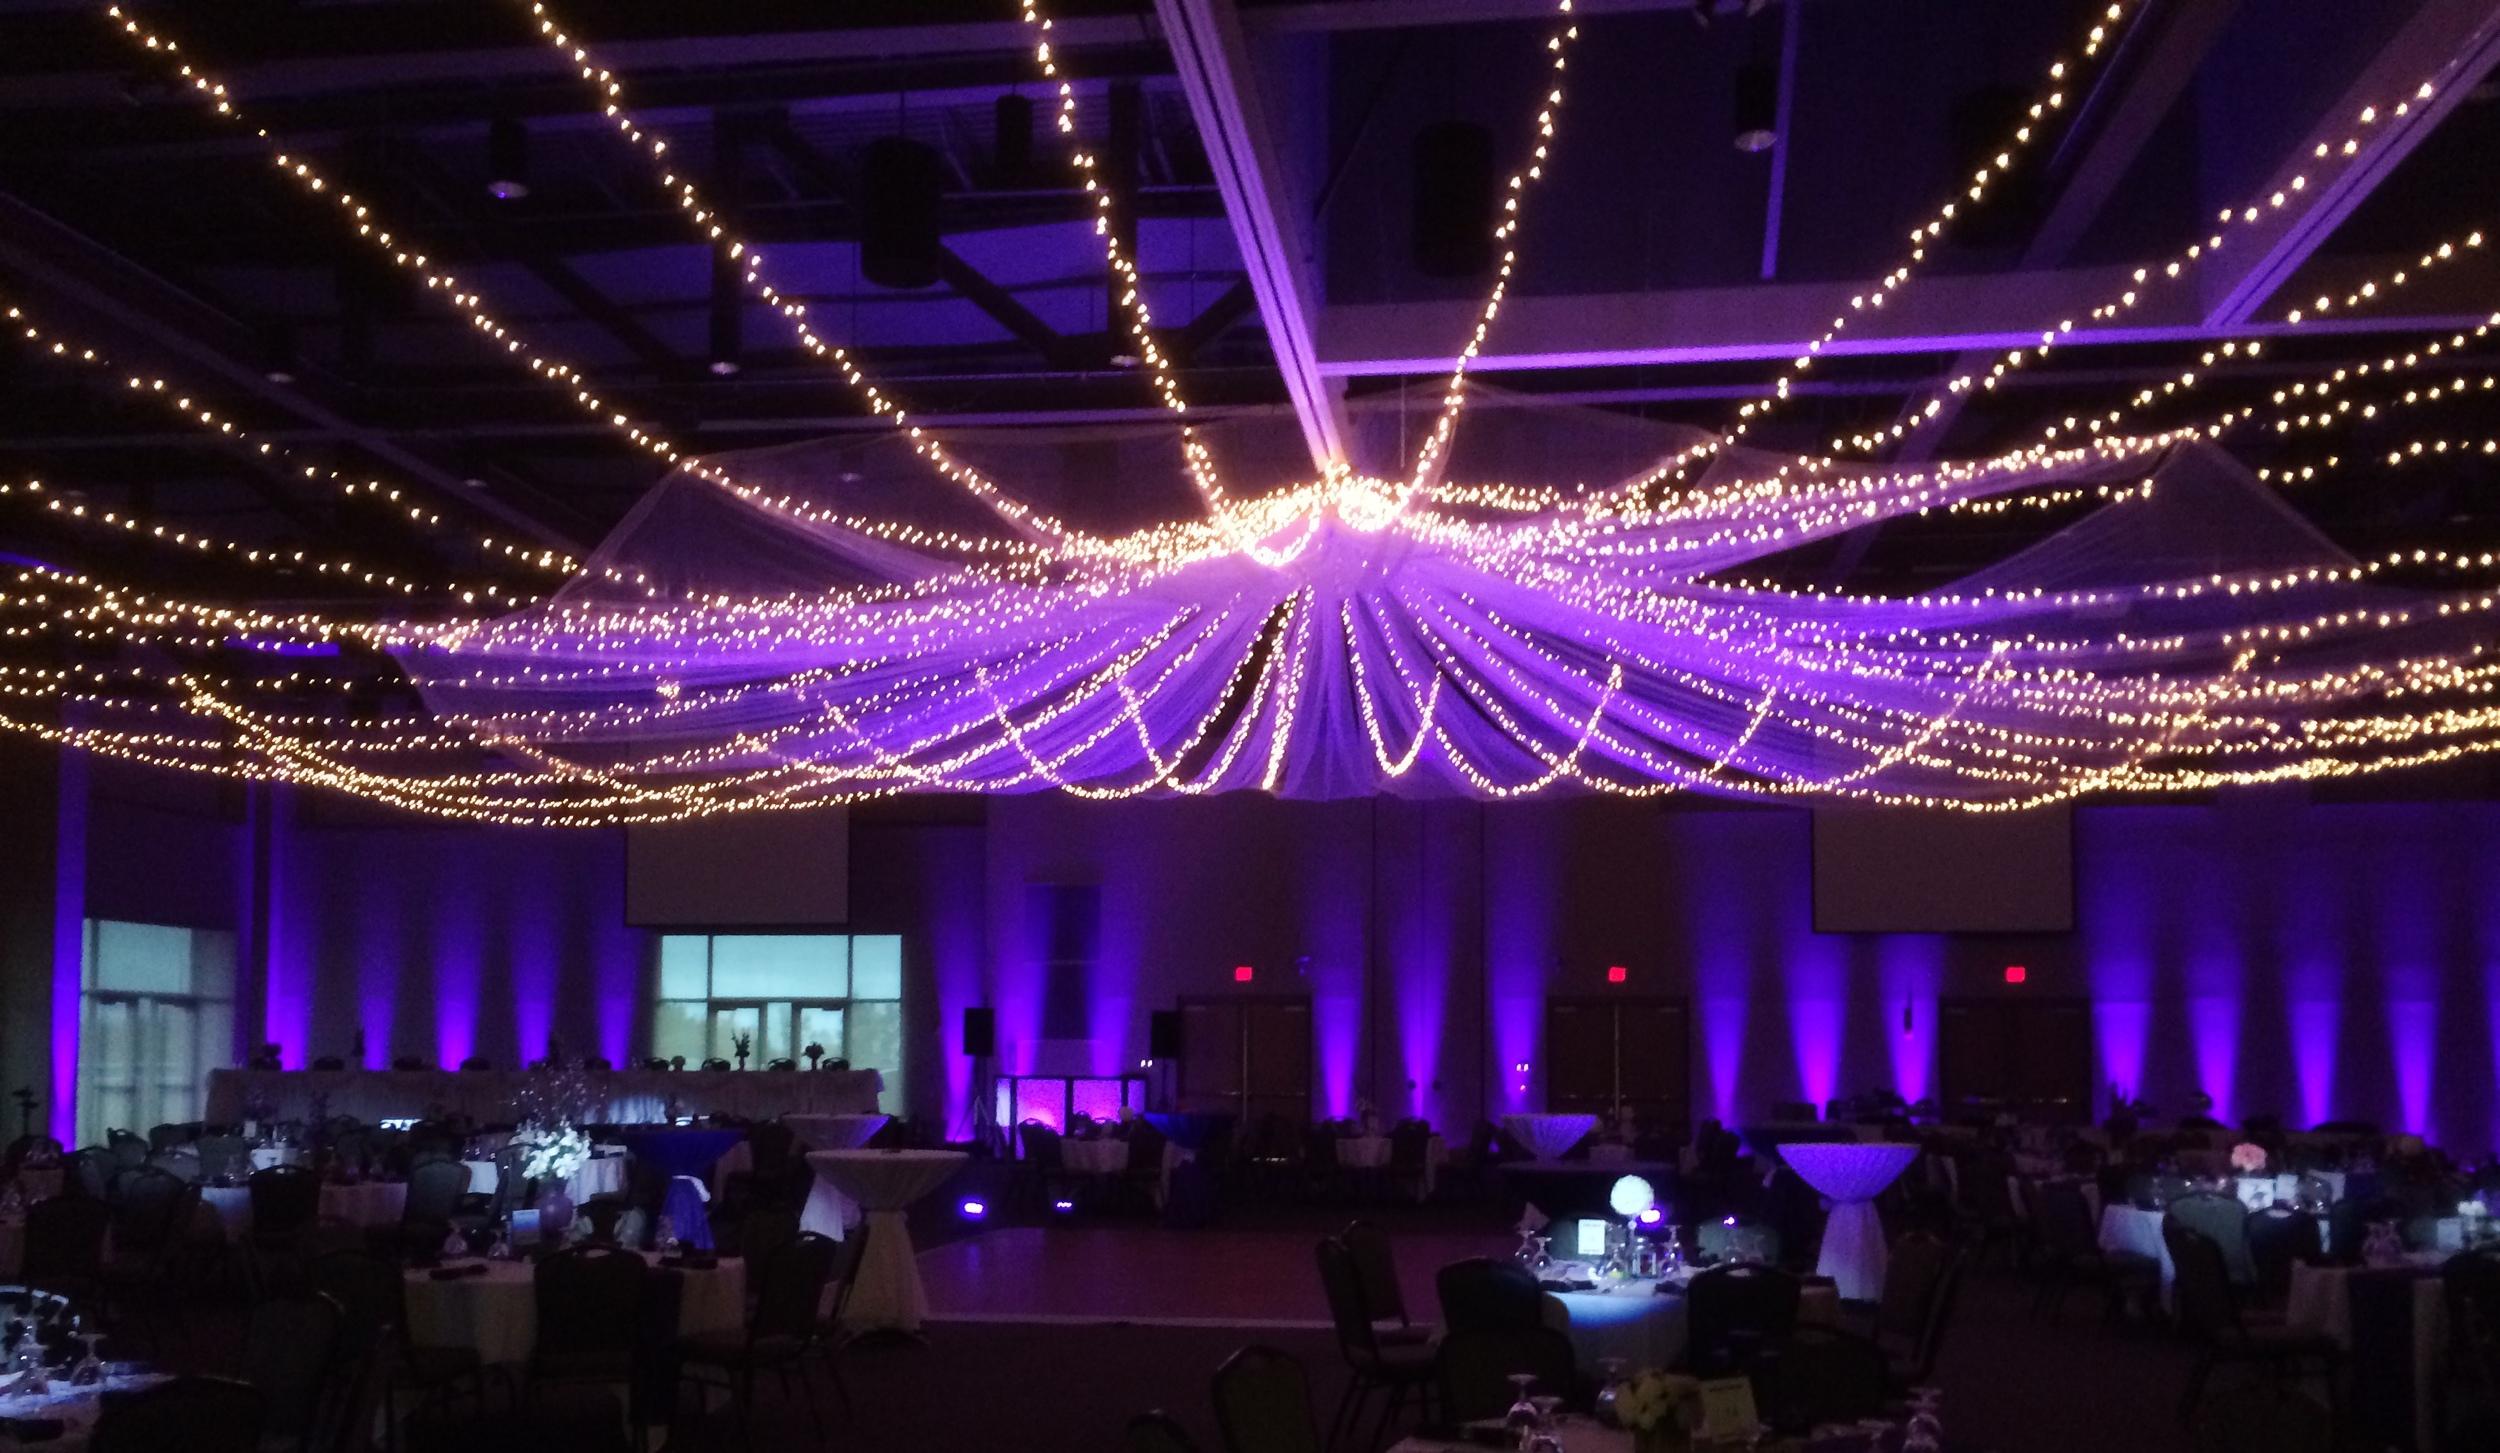 Wedding Reception - Fayetteville Town Center